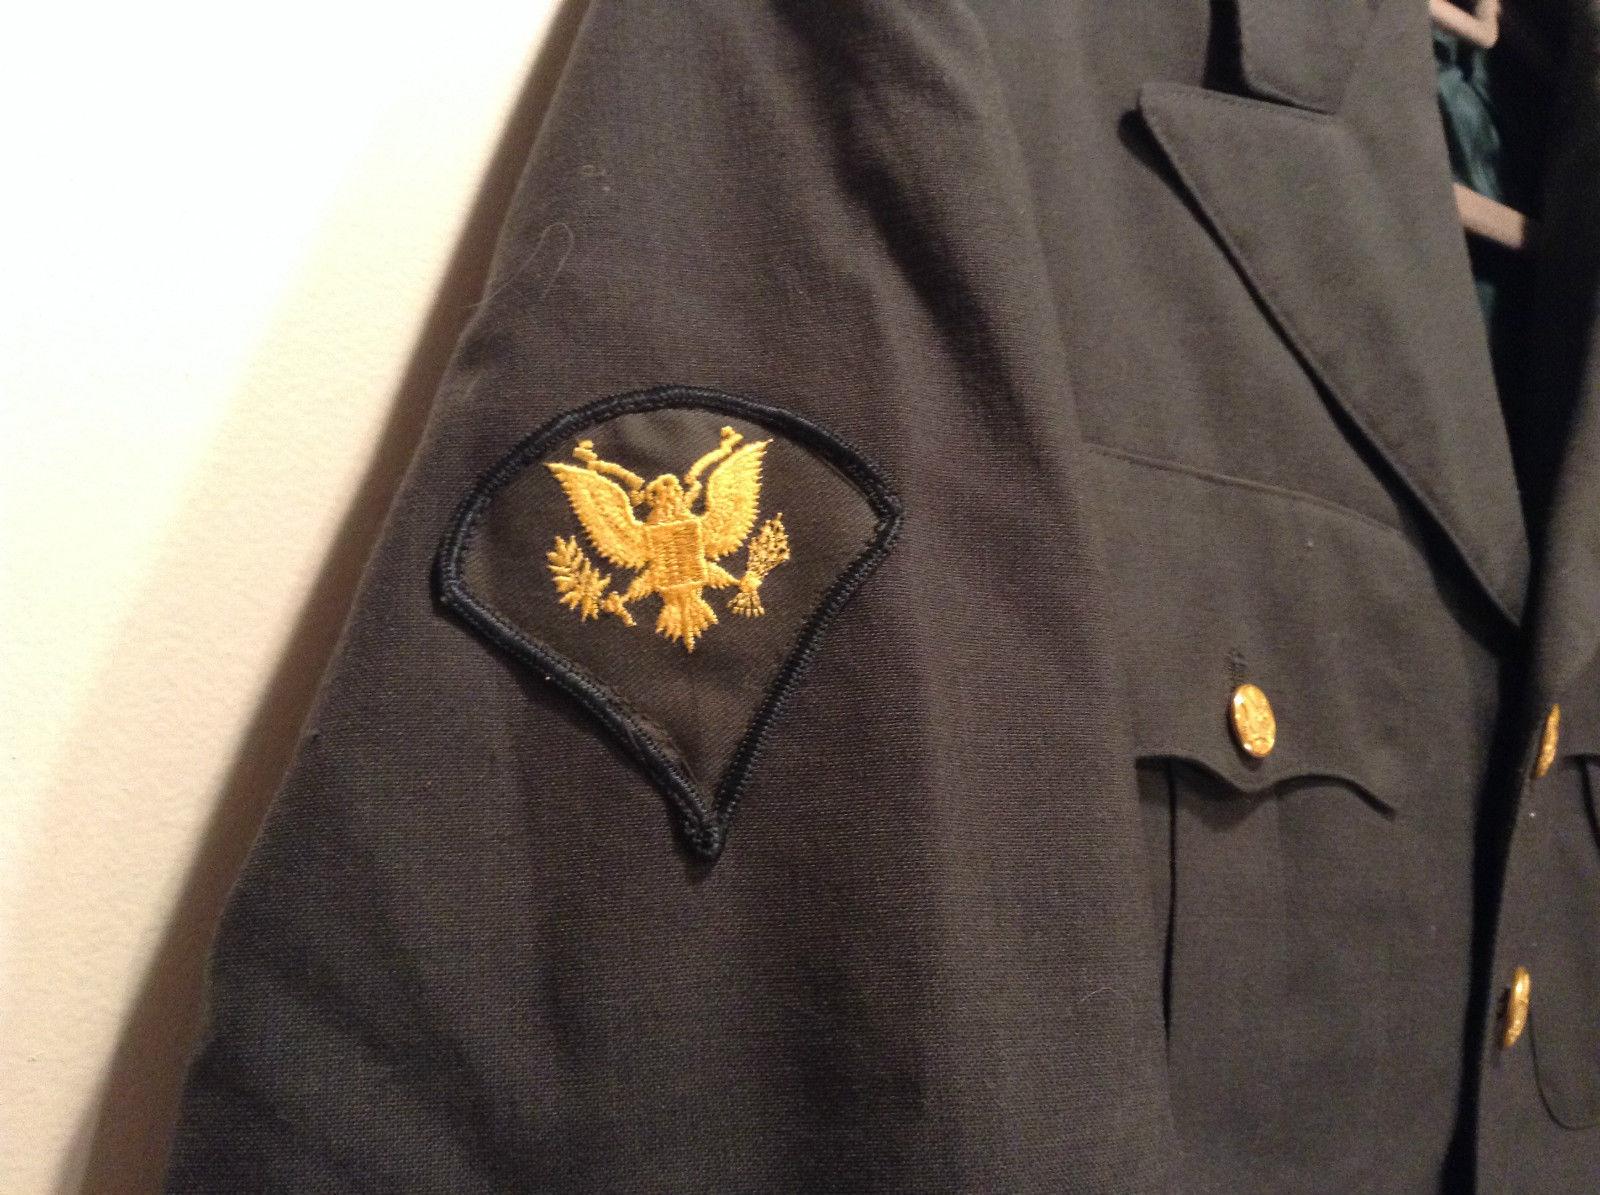 ARMY Uniform Jacket Coat Dark Green Cotton Blend Size 41R  Army Green